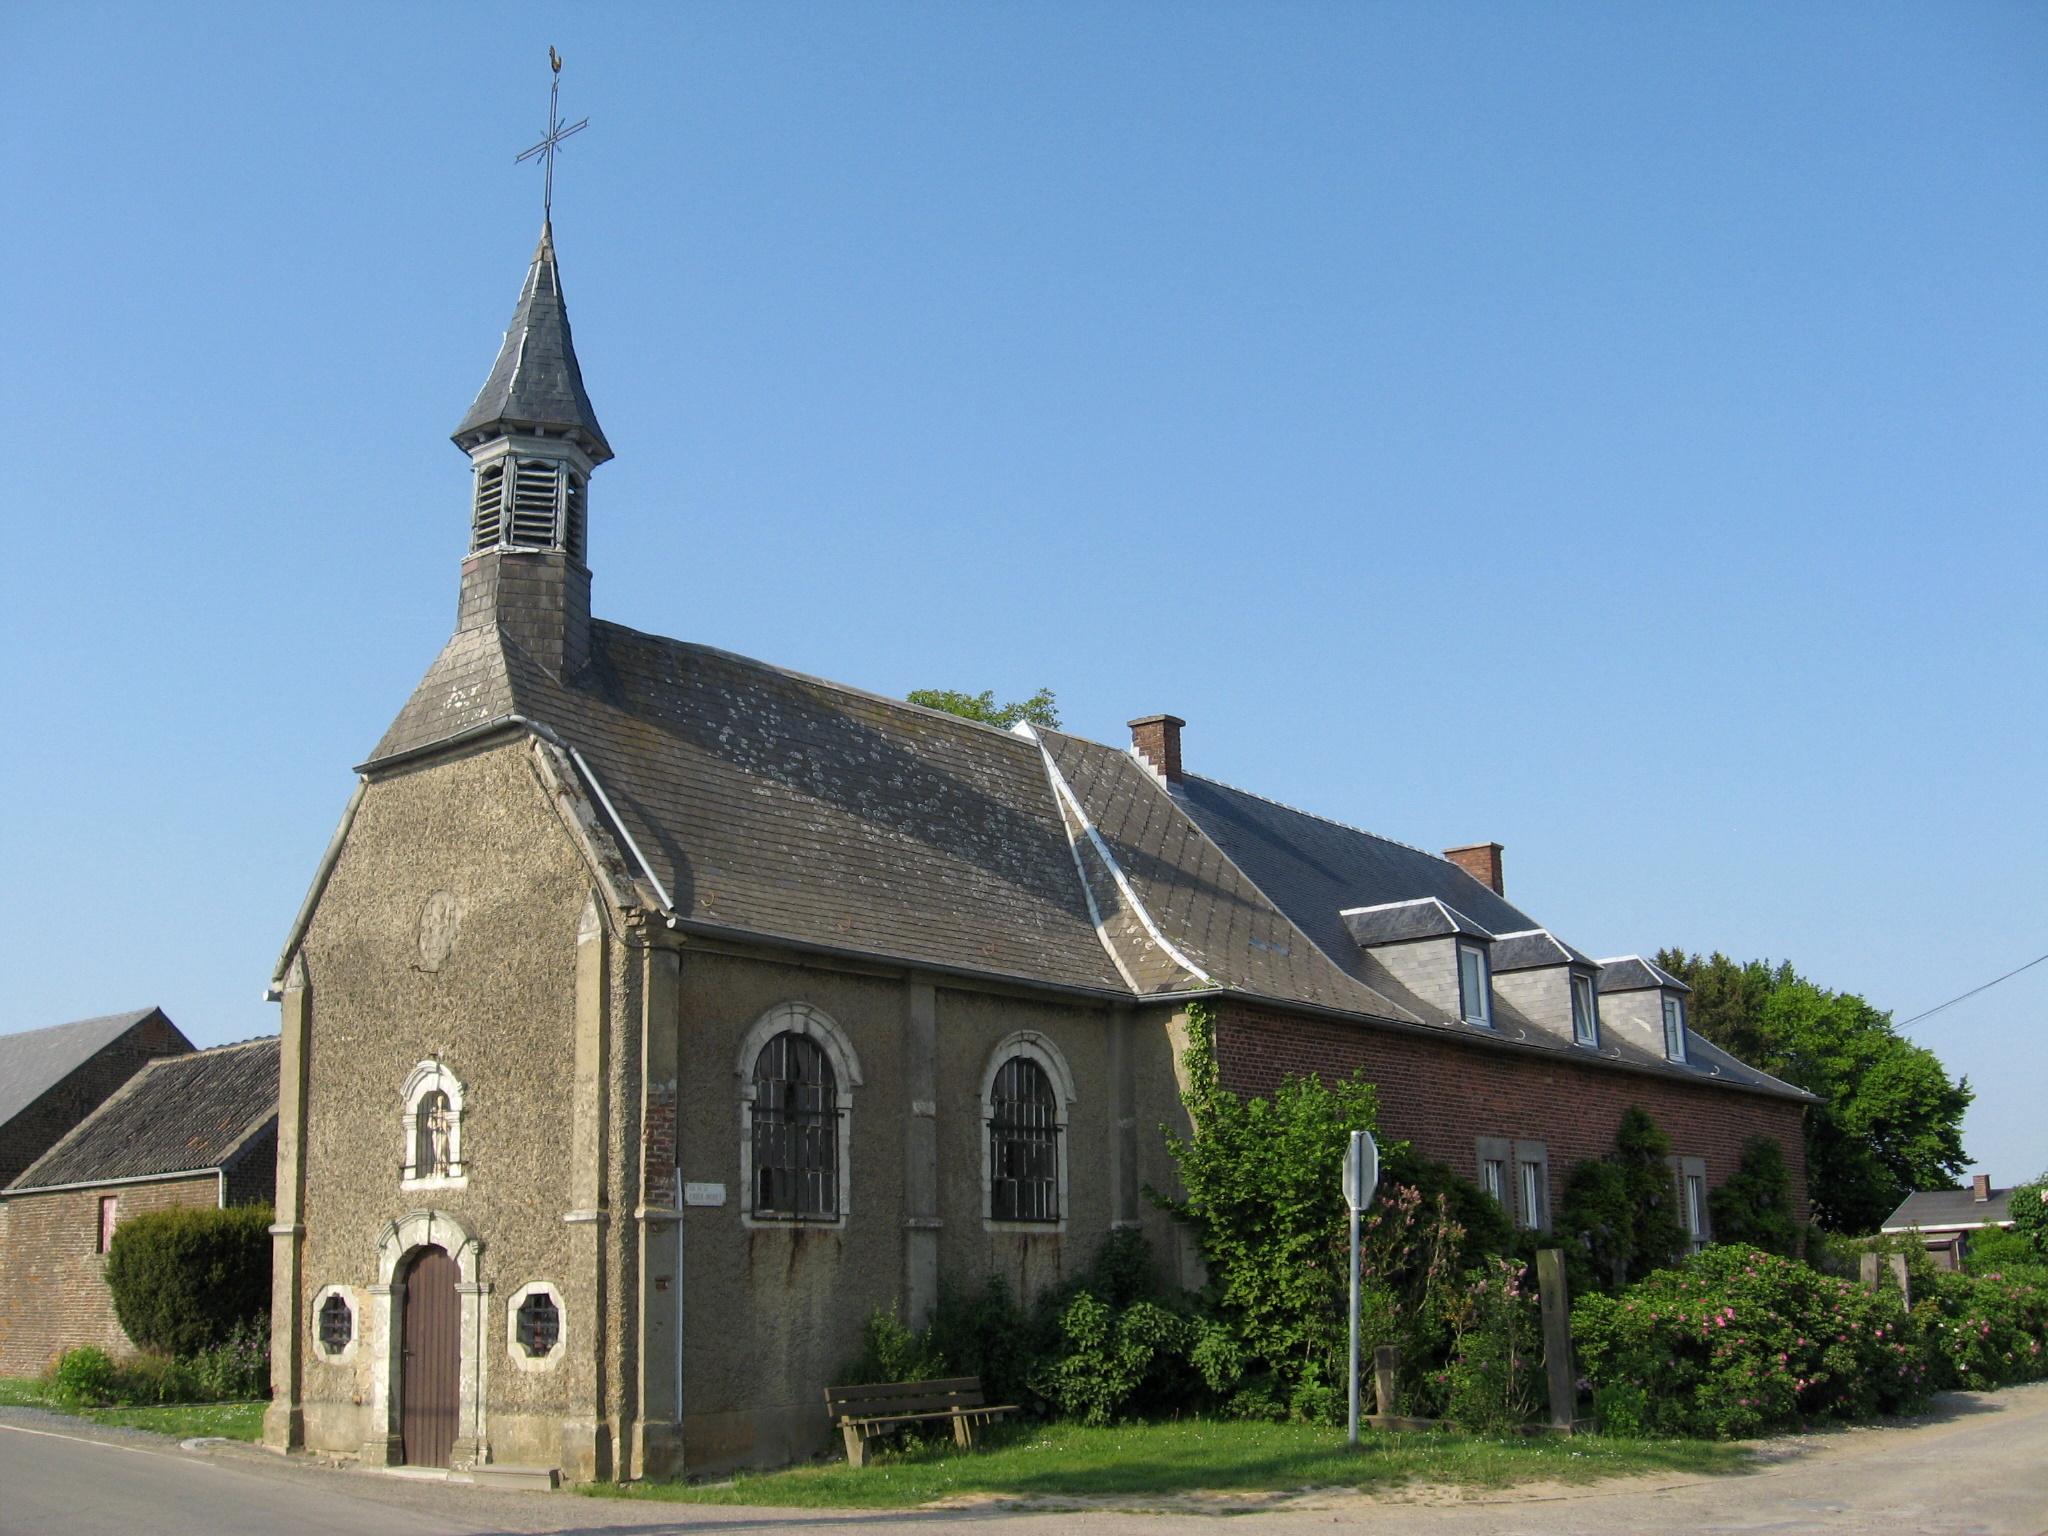 https://upload.wikimedia.org/wikipedia/commons/4/4d/Aische-en-Refail_-_Chapelle_Croix-Monet.jpg